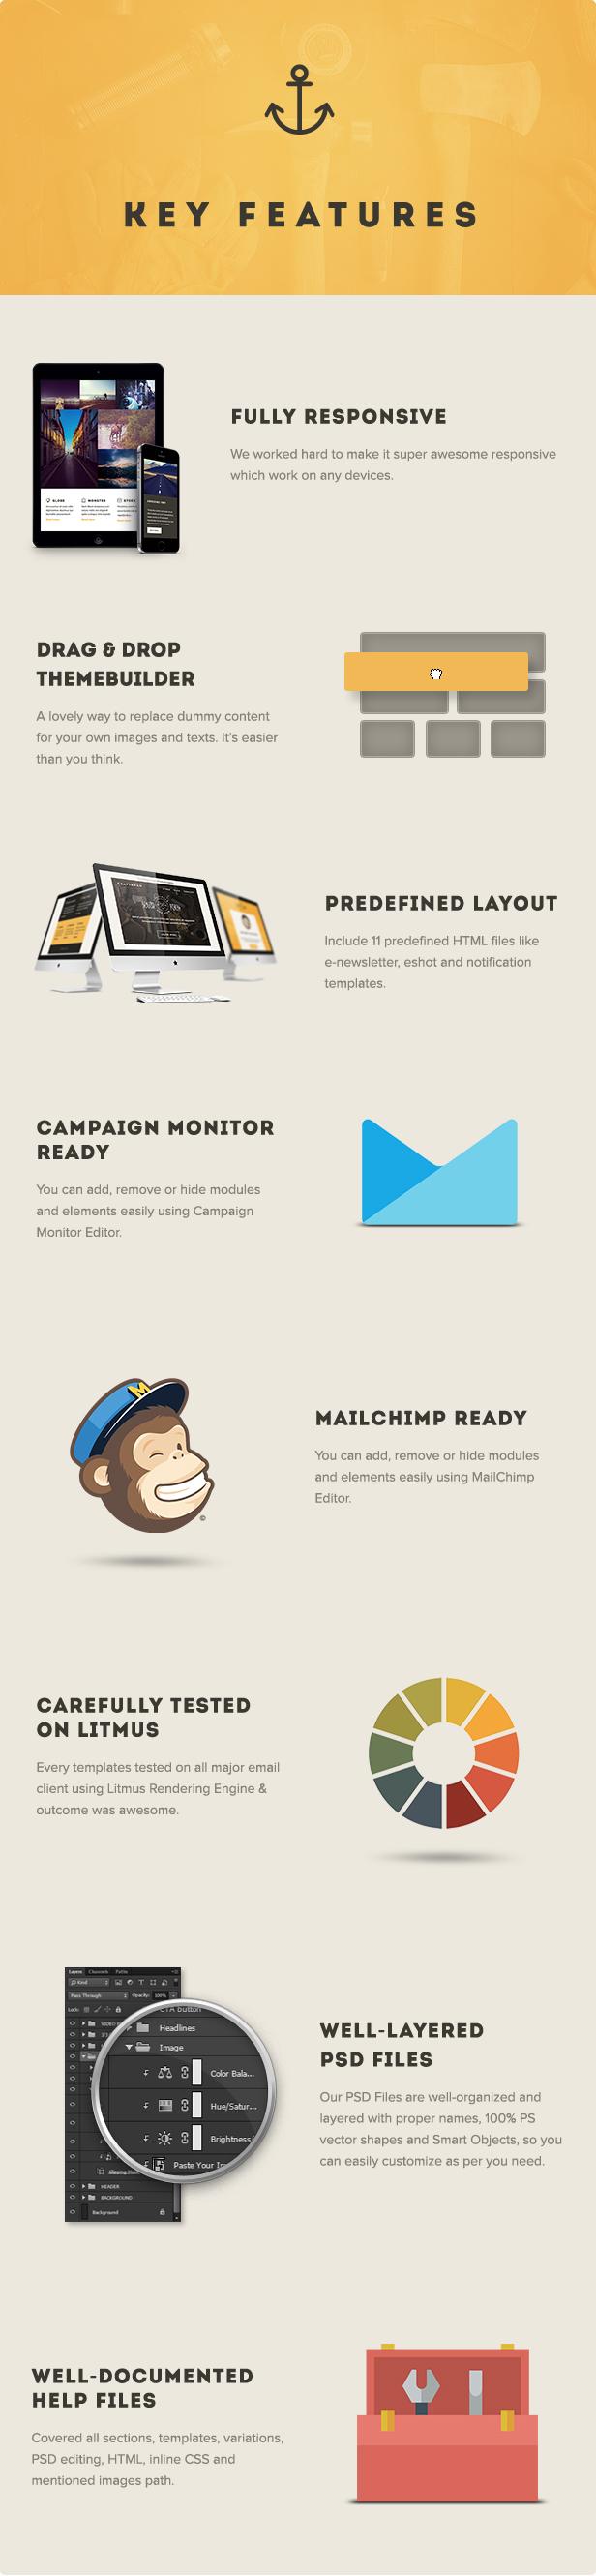 Craftsman - Email, Eshot, Notification Template - 8